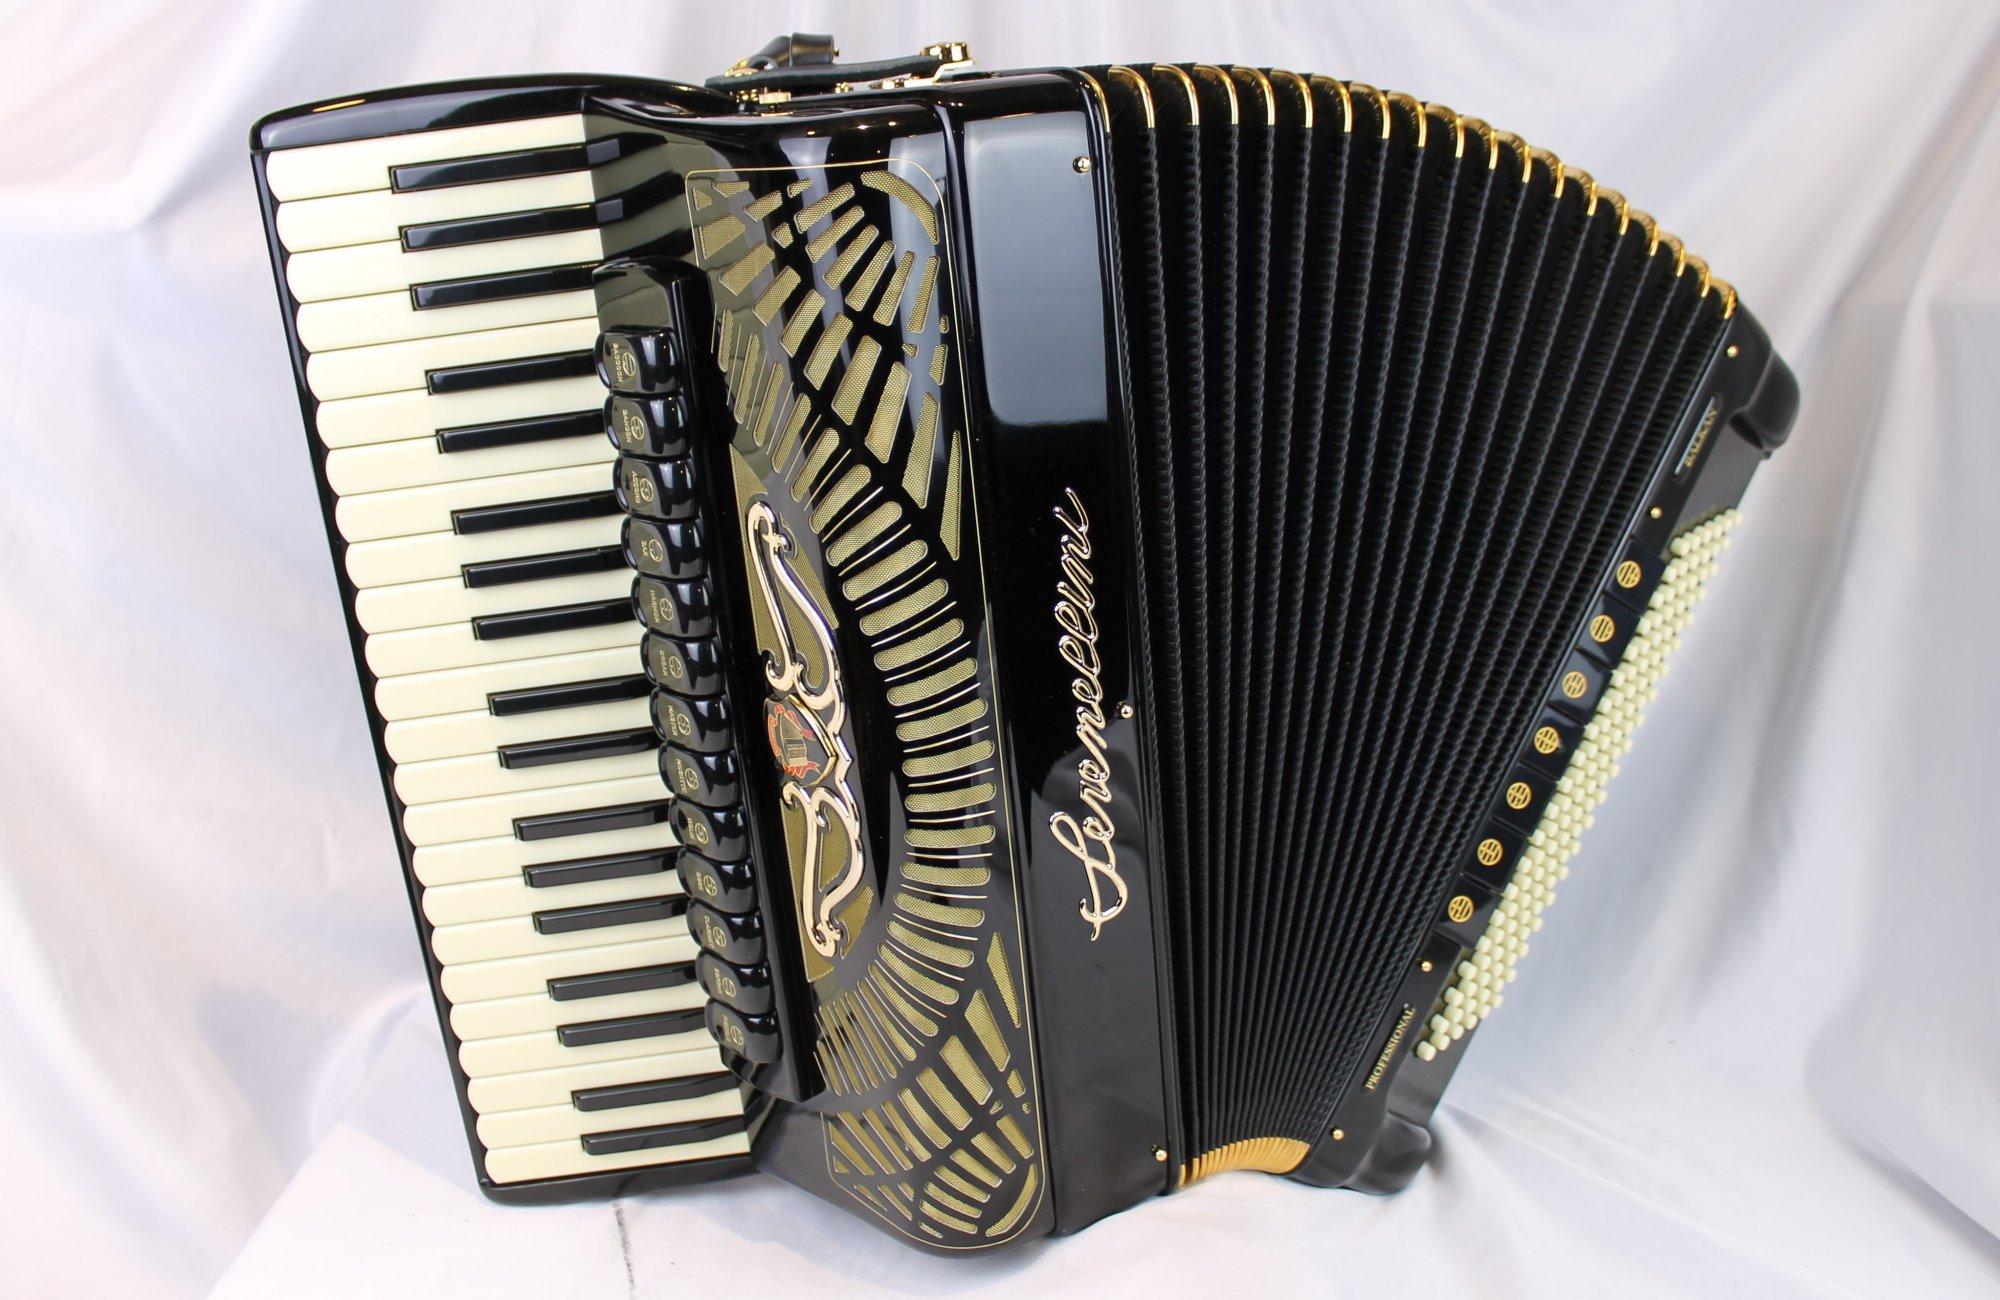 NEW Black Serenellini Balkan Gold Piano Accordion Binci LMMH 41 120